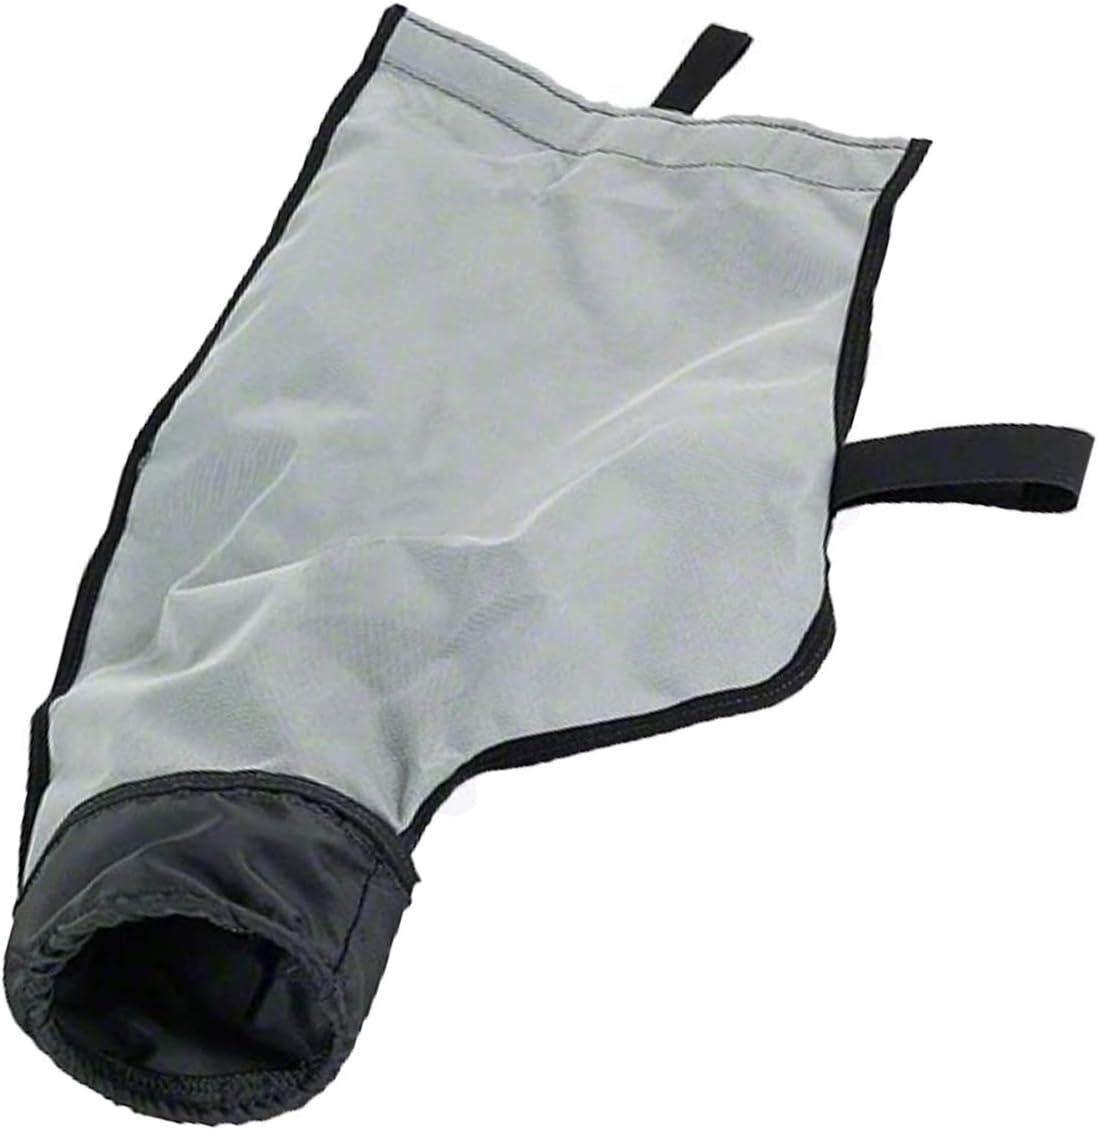 ATIE Pool Cleaner Debris Bag Kit 360240 Replacement (w/o Collar) Fits for Pentair Racer 360228/360330 Pool Cleaner Debris Bag 360240 (1 Pack)